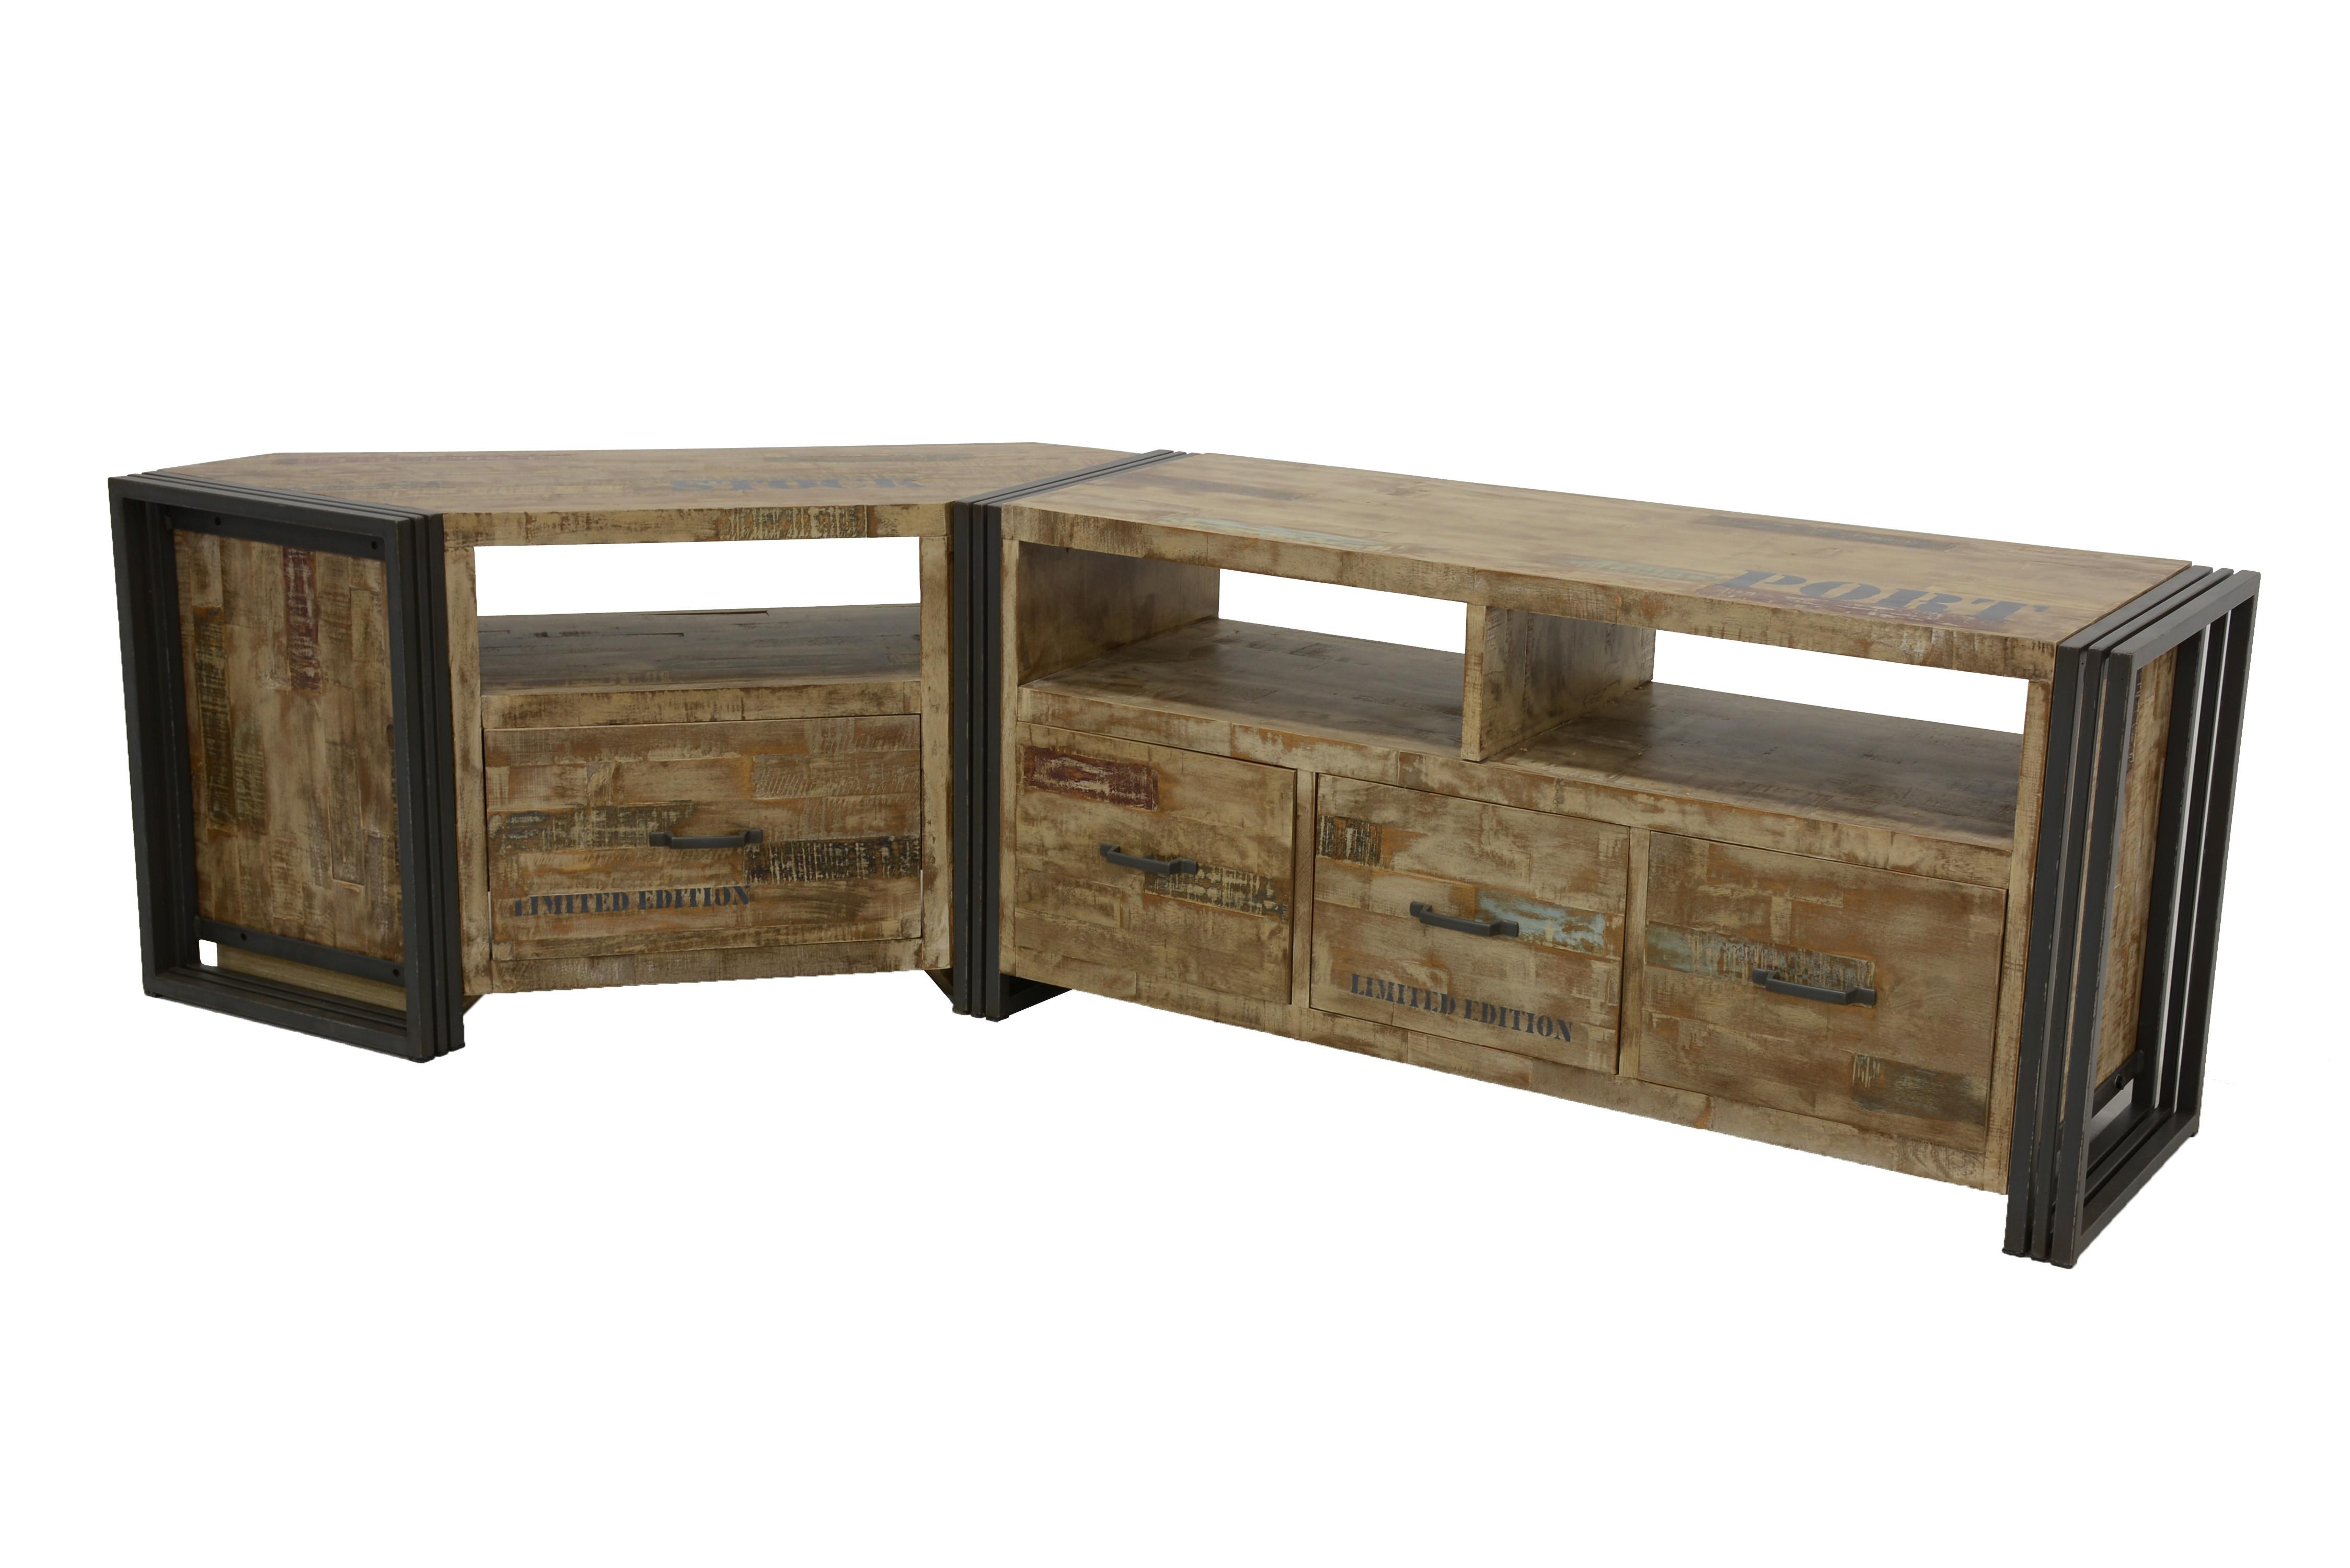 meuble tv d angle hevea recycle blanchi et metal noirci 1 tiroir 1 niche 115x40x55cm docker